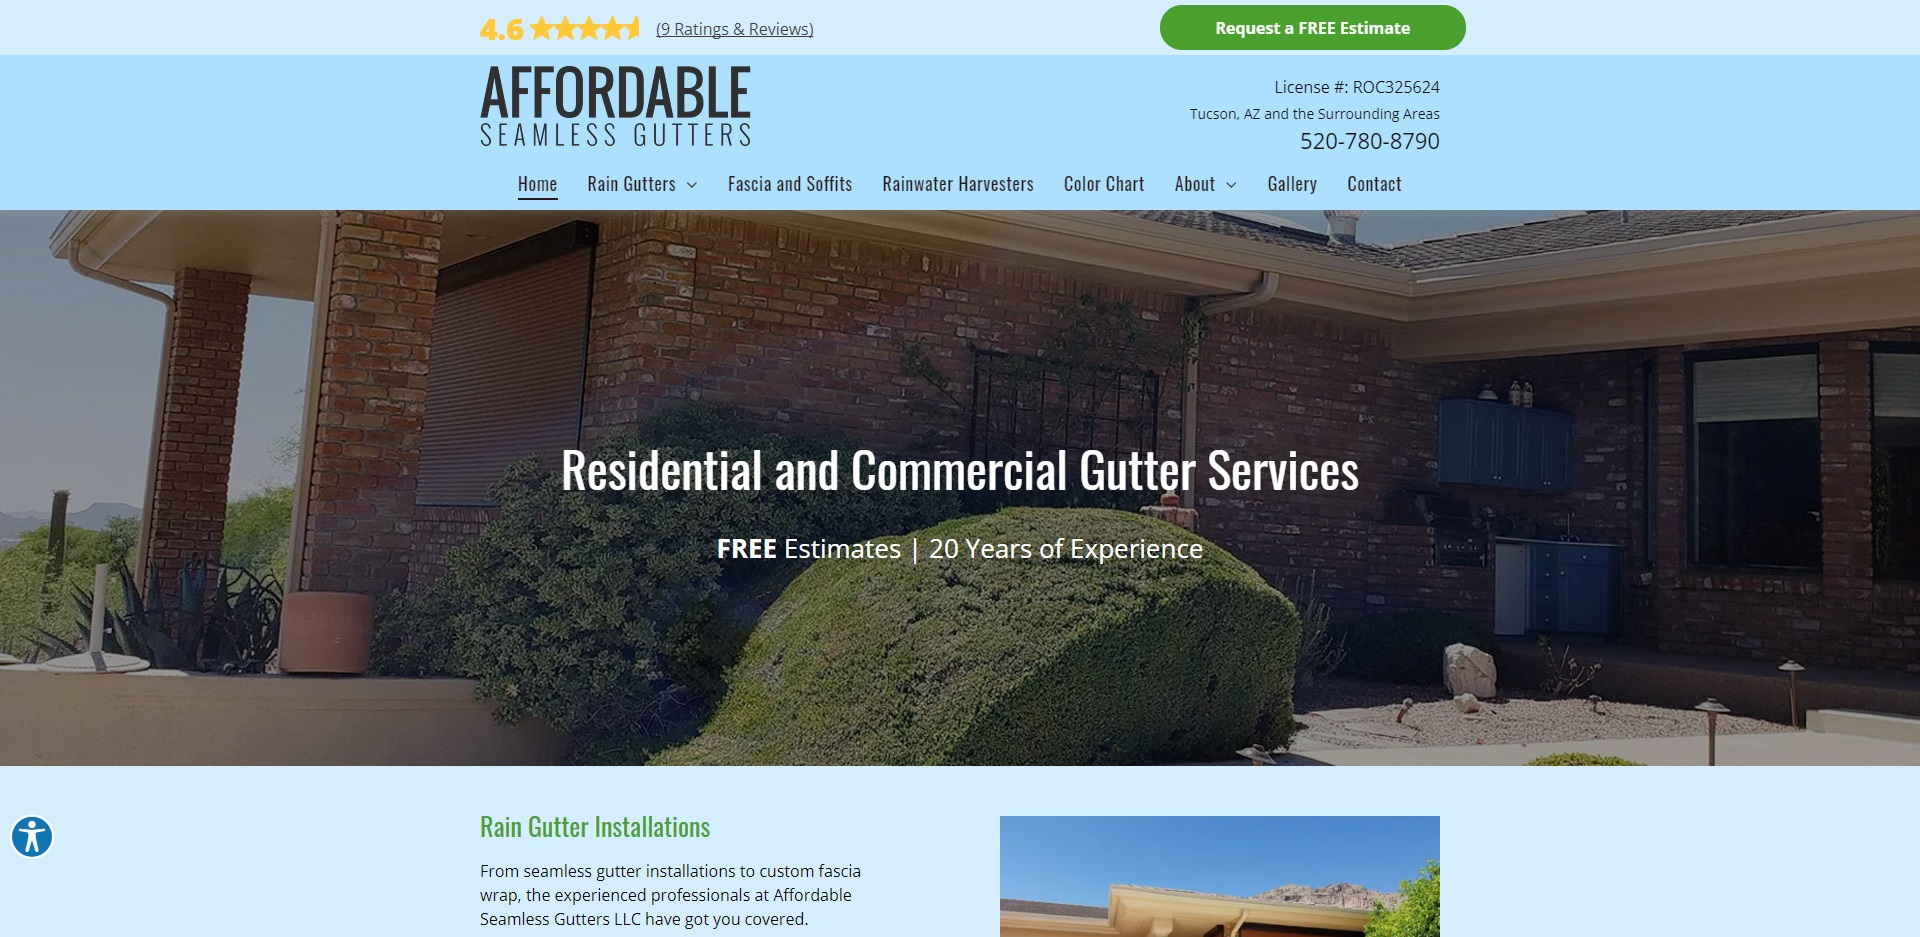 The Best Gutter Maintenance in Tucson, AZ